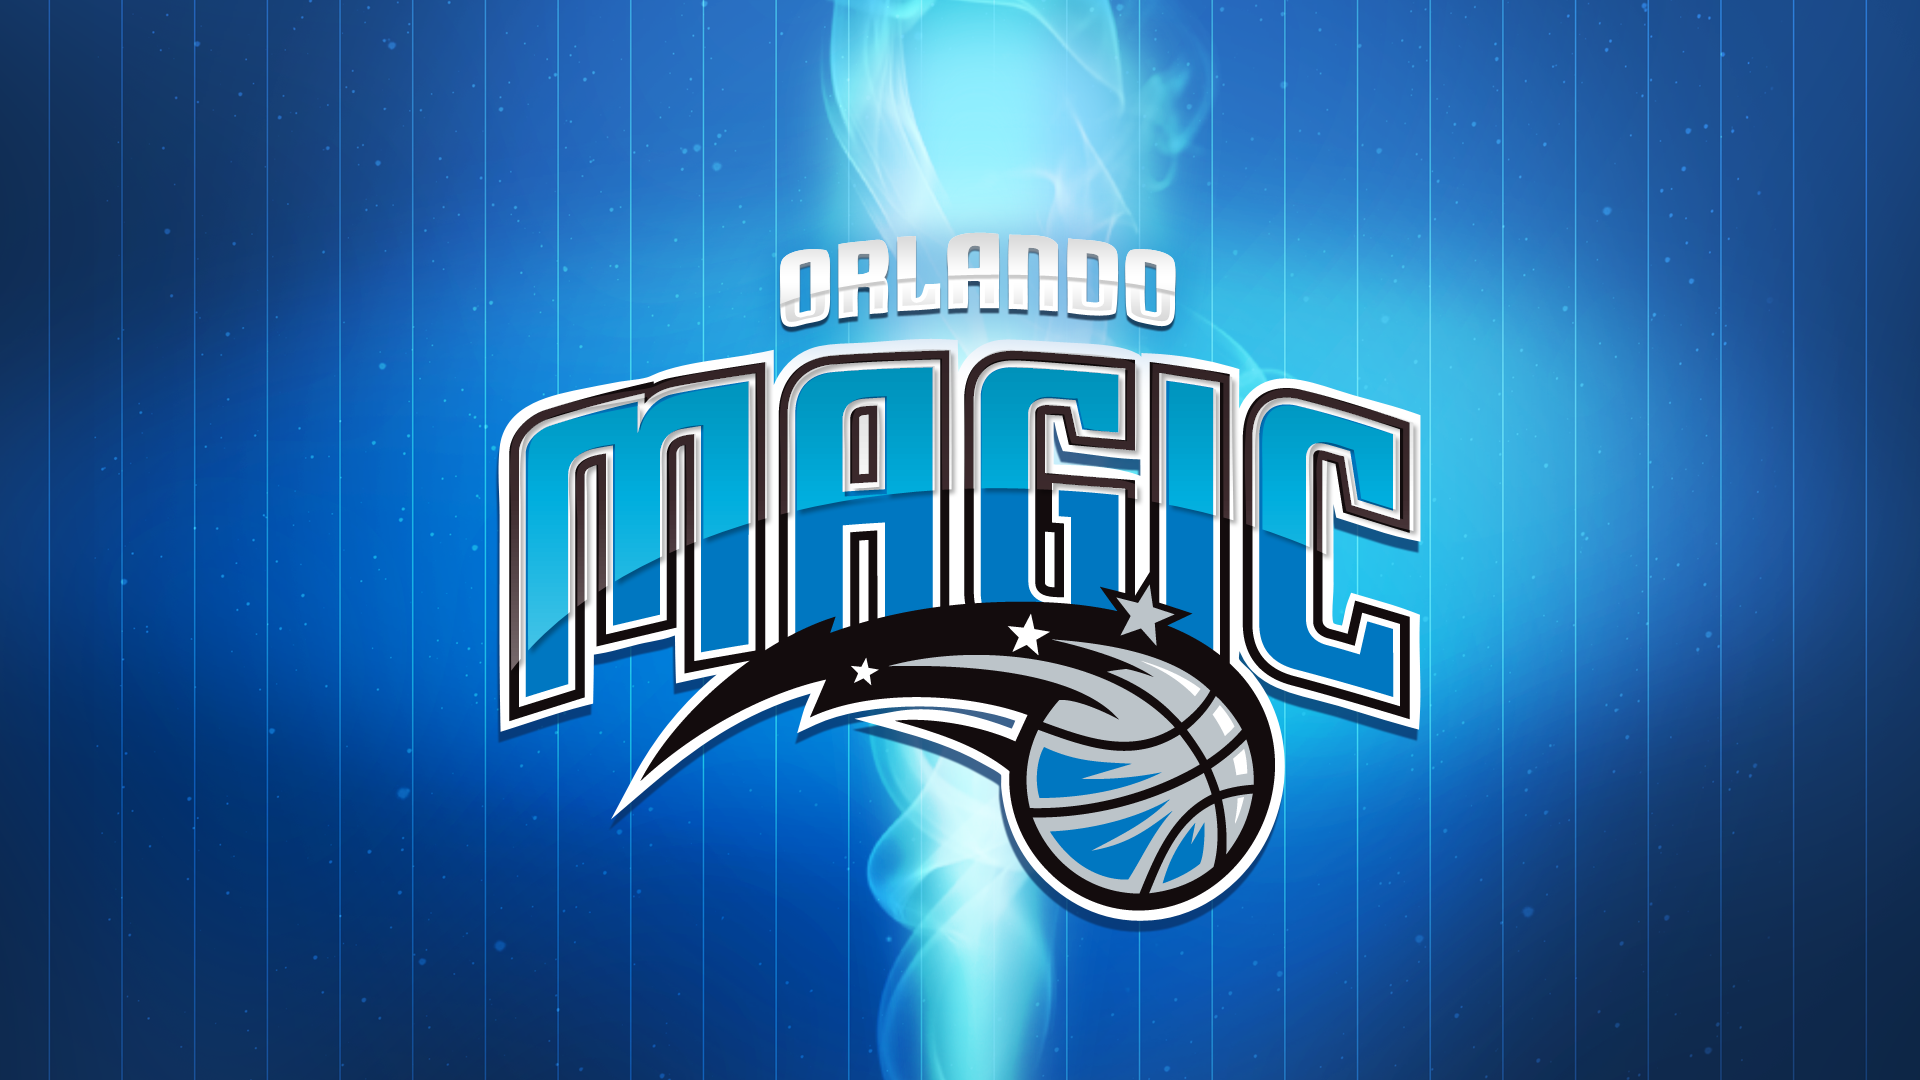 Orlando Magic Wallpapers - Wallpaper Cave